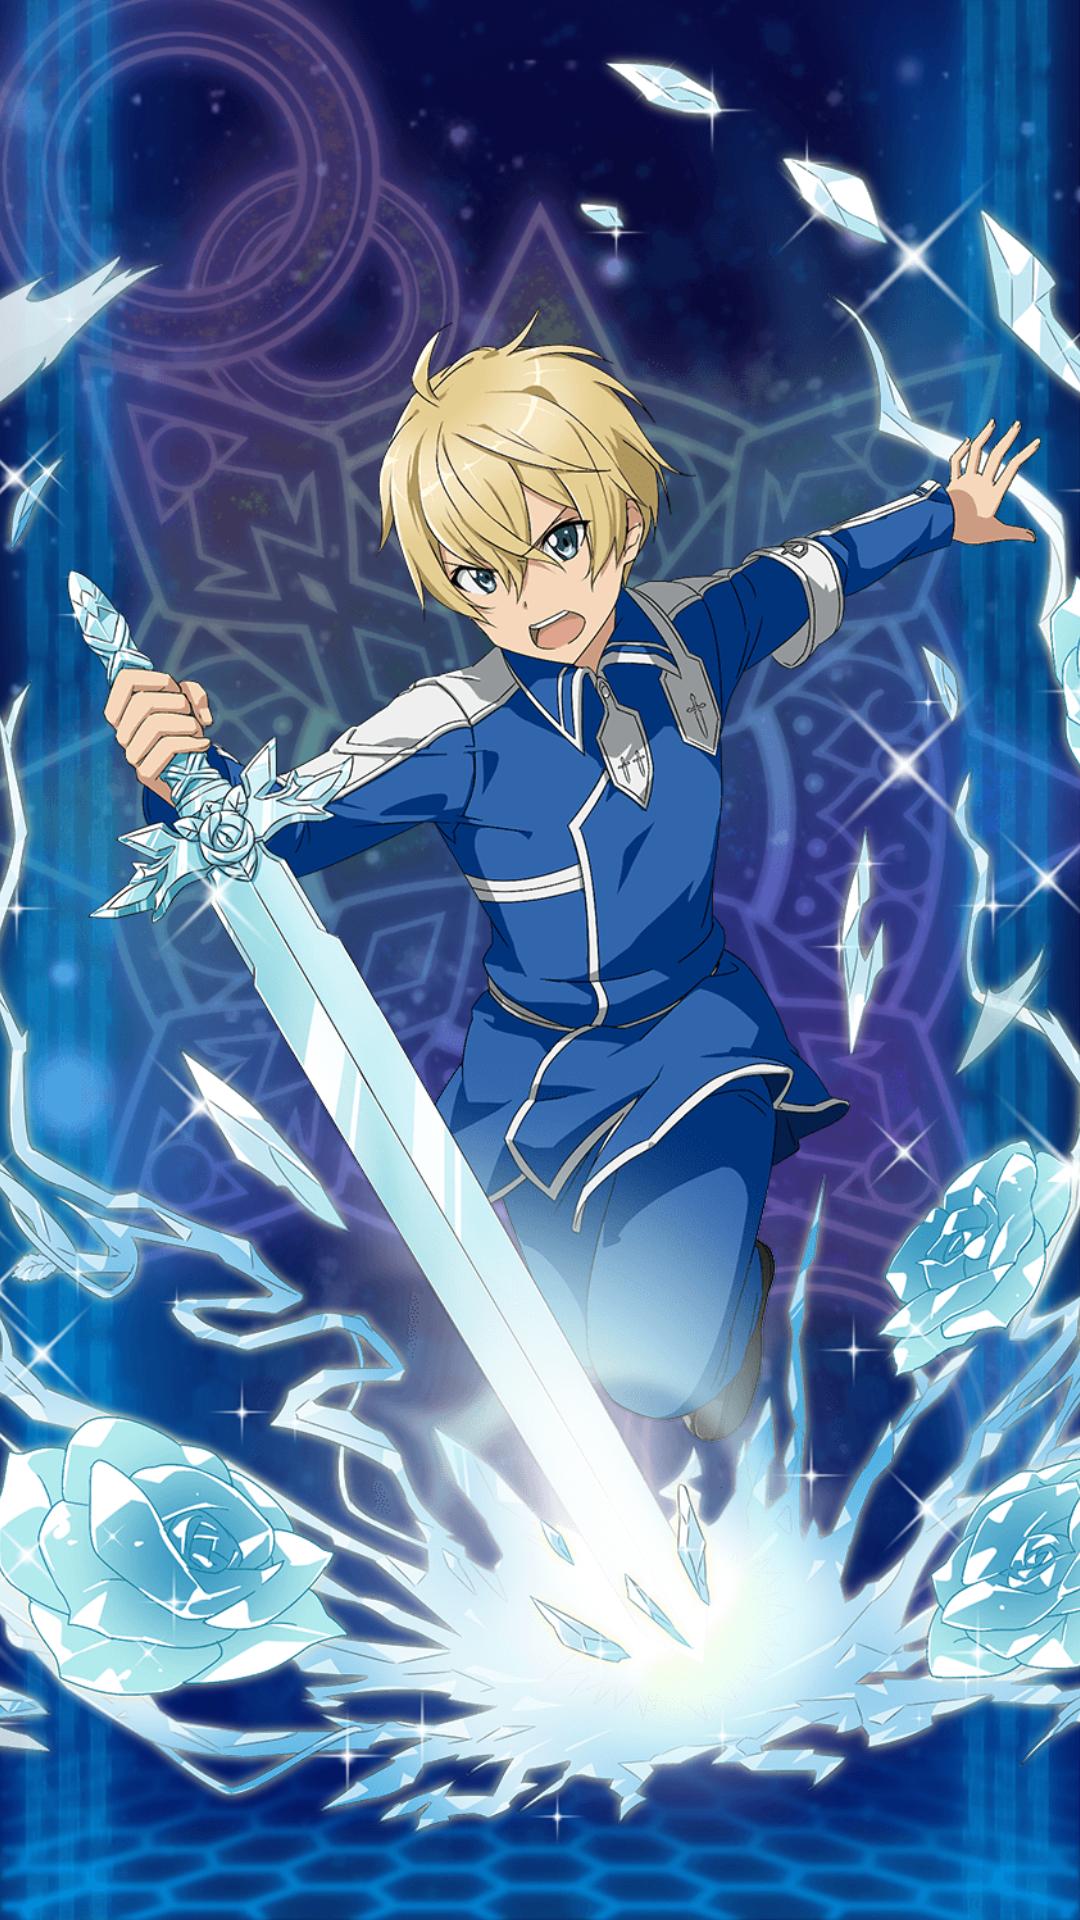 Eugeo Personaje Perteneciente Al Arco De Alicization Kirito De Sword Art Online Línea De Arte Arte De Anime